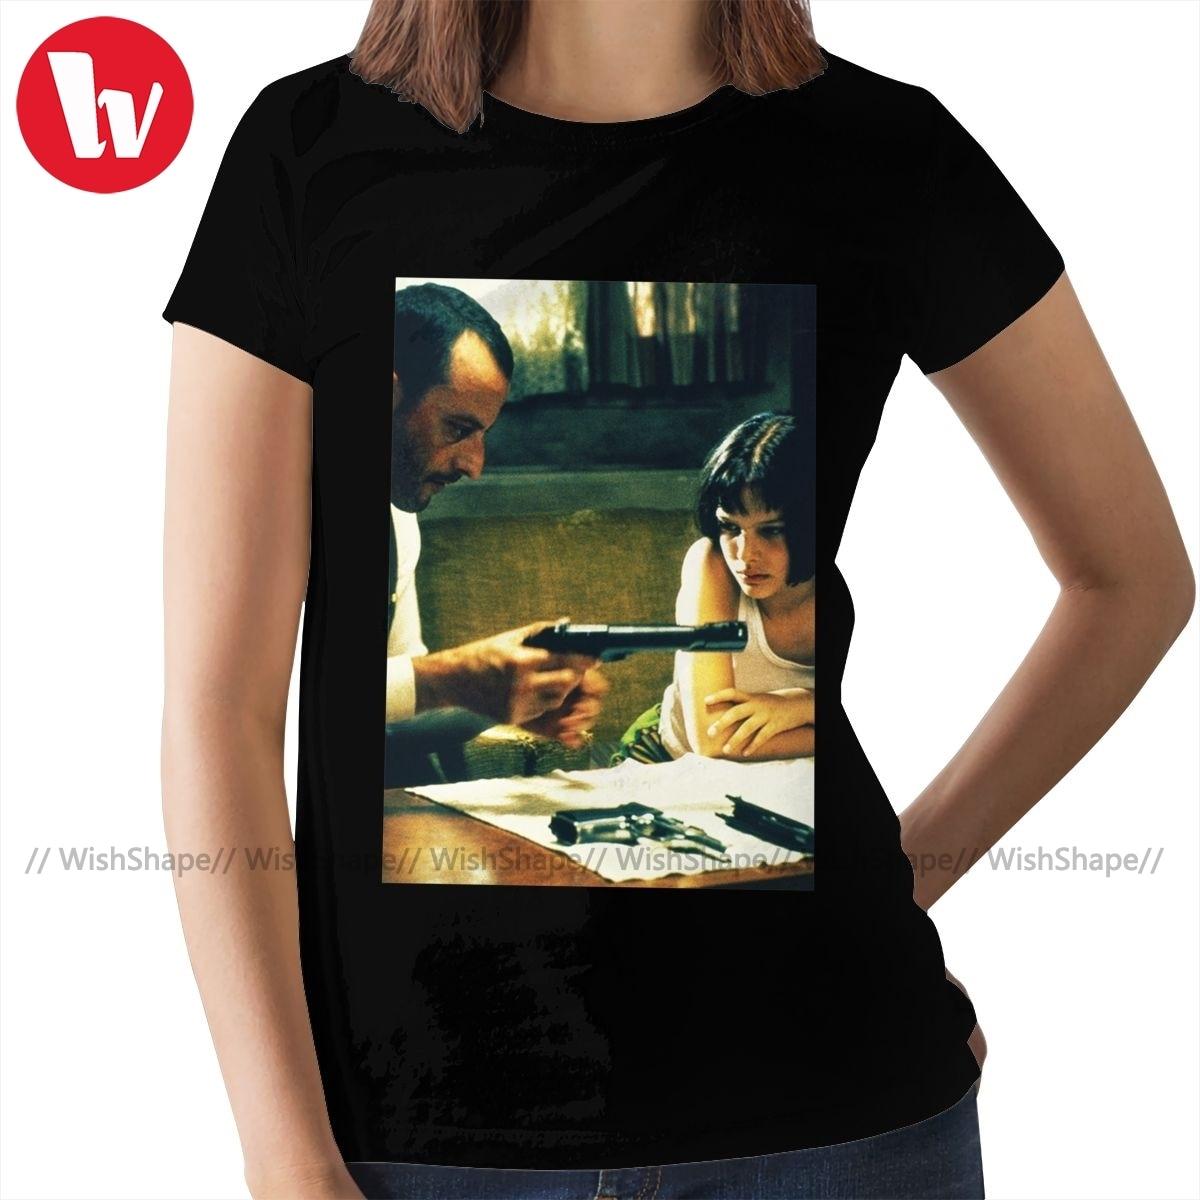 Camiseta profesional Leon The Professional, Camiseta con estampado de Leon The Professional de Portman, Camiseta de cuello redondo para mujer, camiseta para mujer